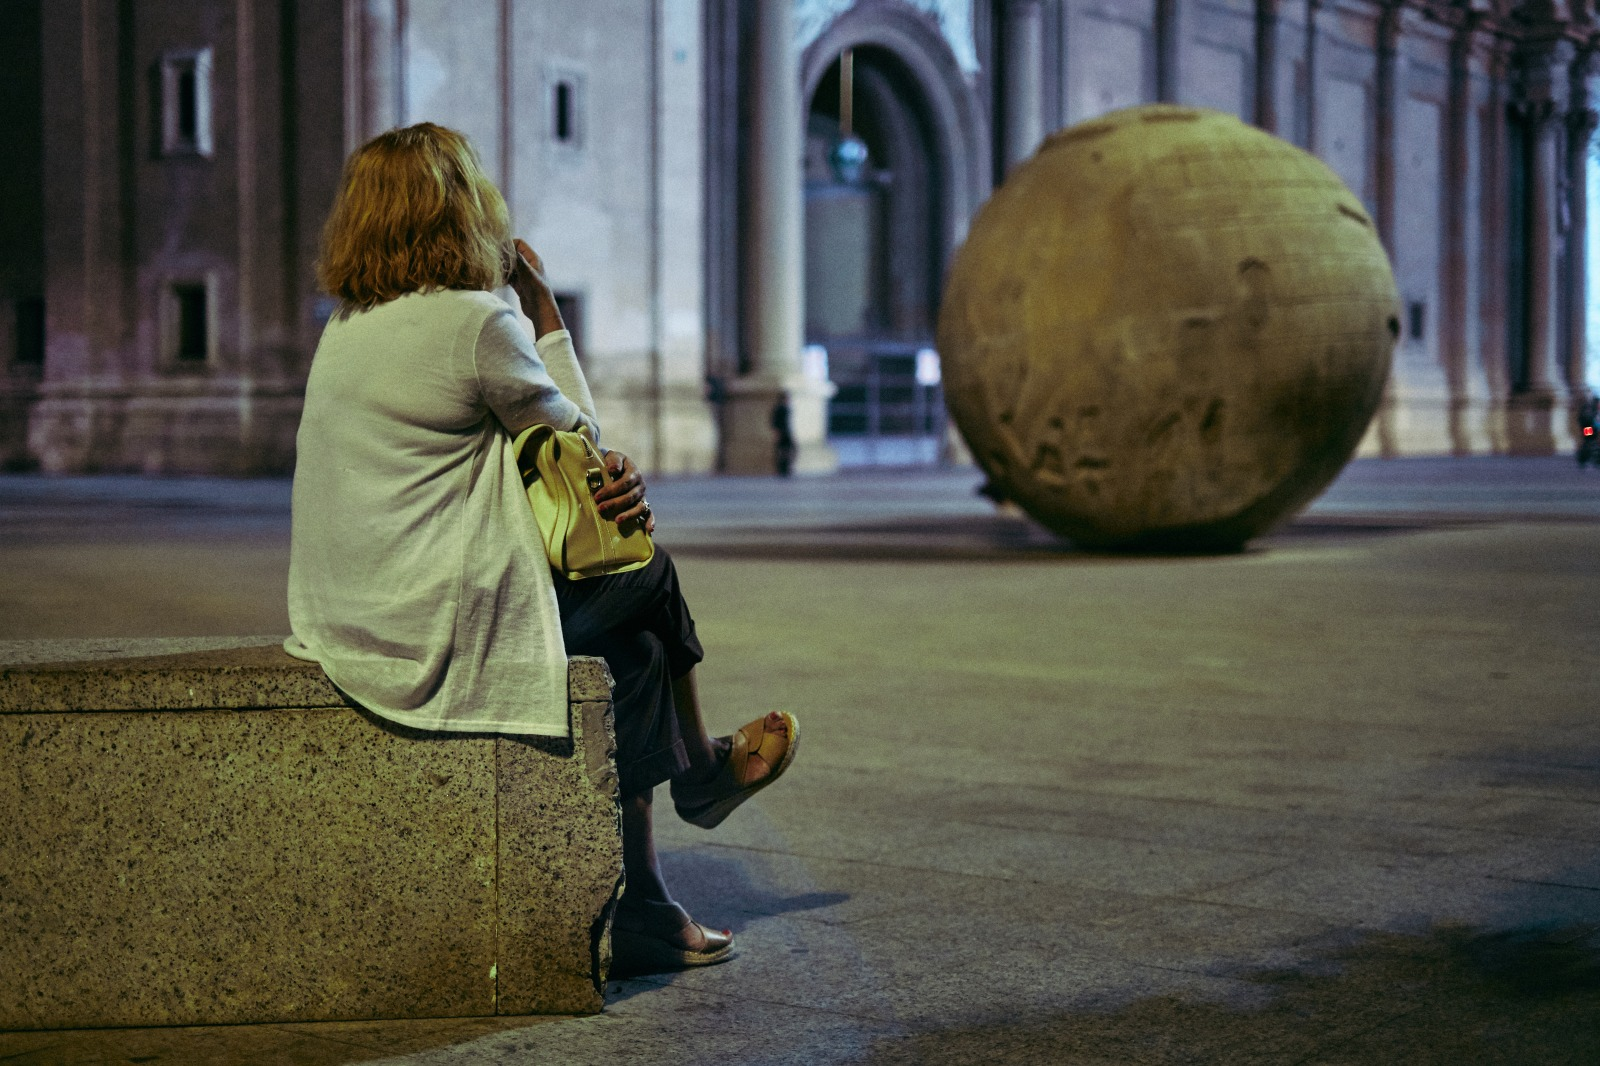 Fotografía de Calle nocturna en Zaragoza con Rober Tomas http://robertomasfoto.com